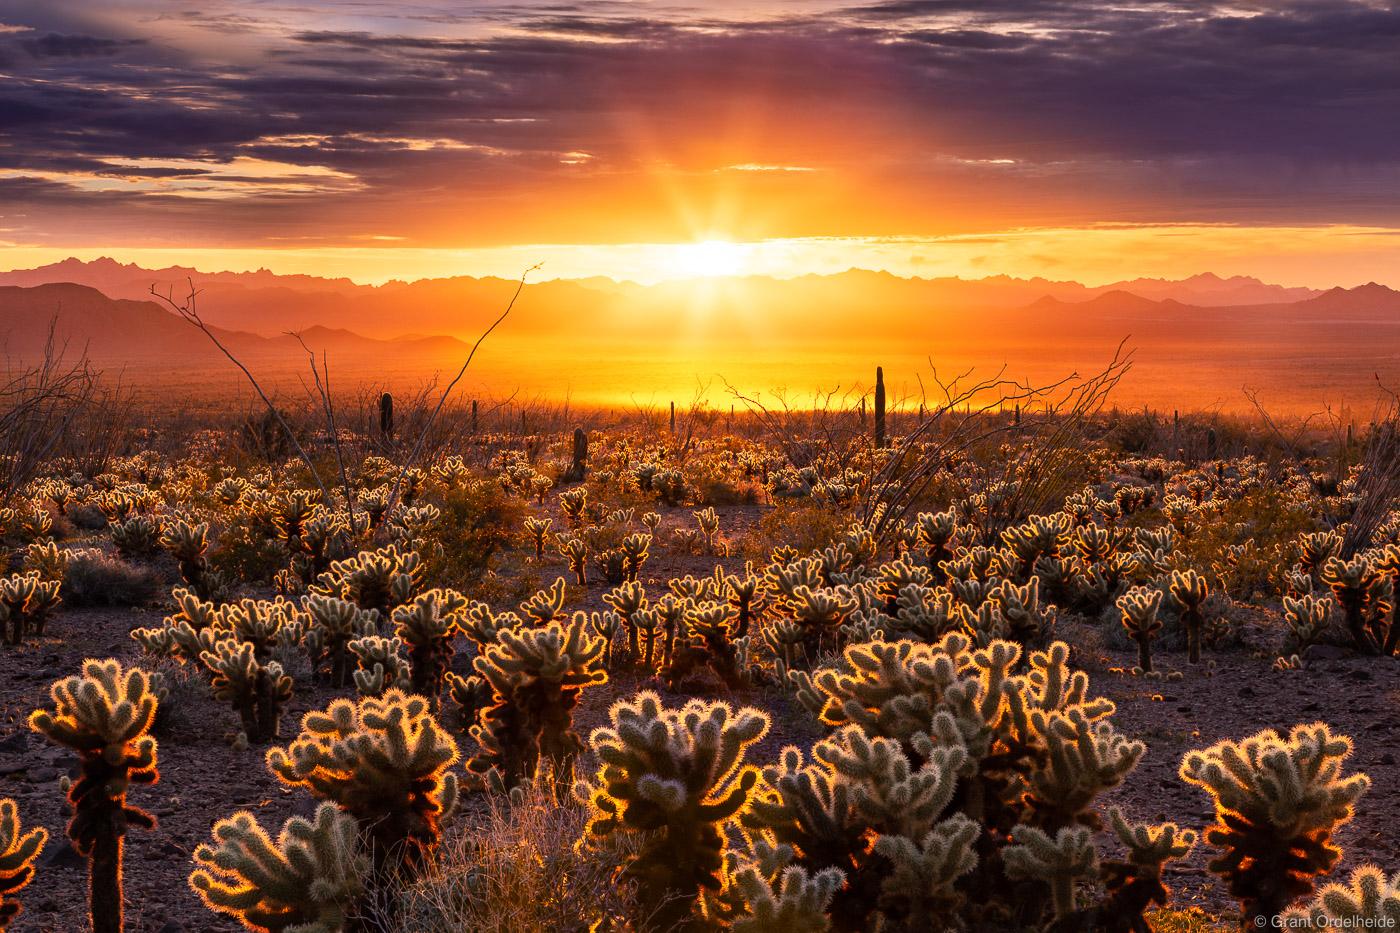 Sunset over a cholla cactus garden in Arizona's Kofa National Wildlife Refuge.